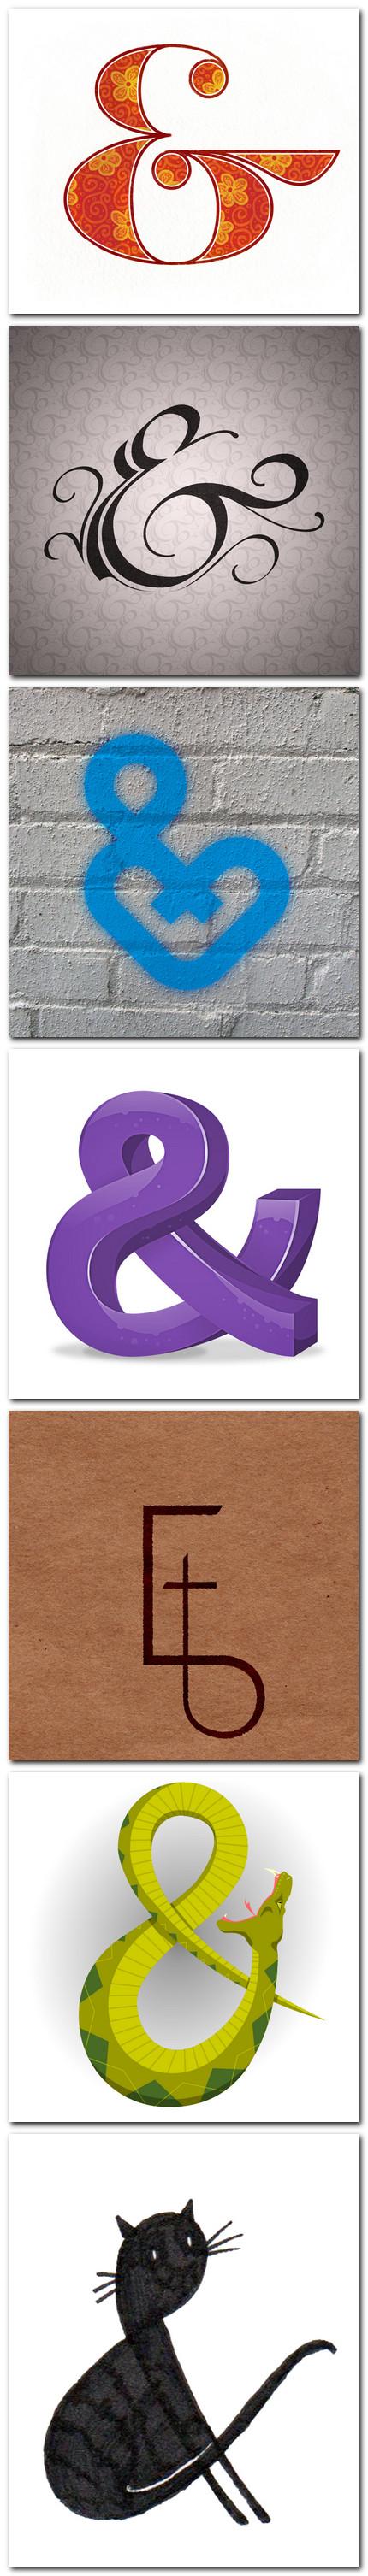 ampersand 2 pe lettercult